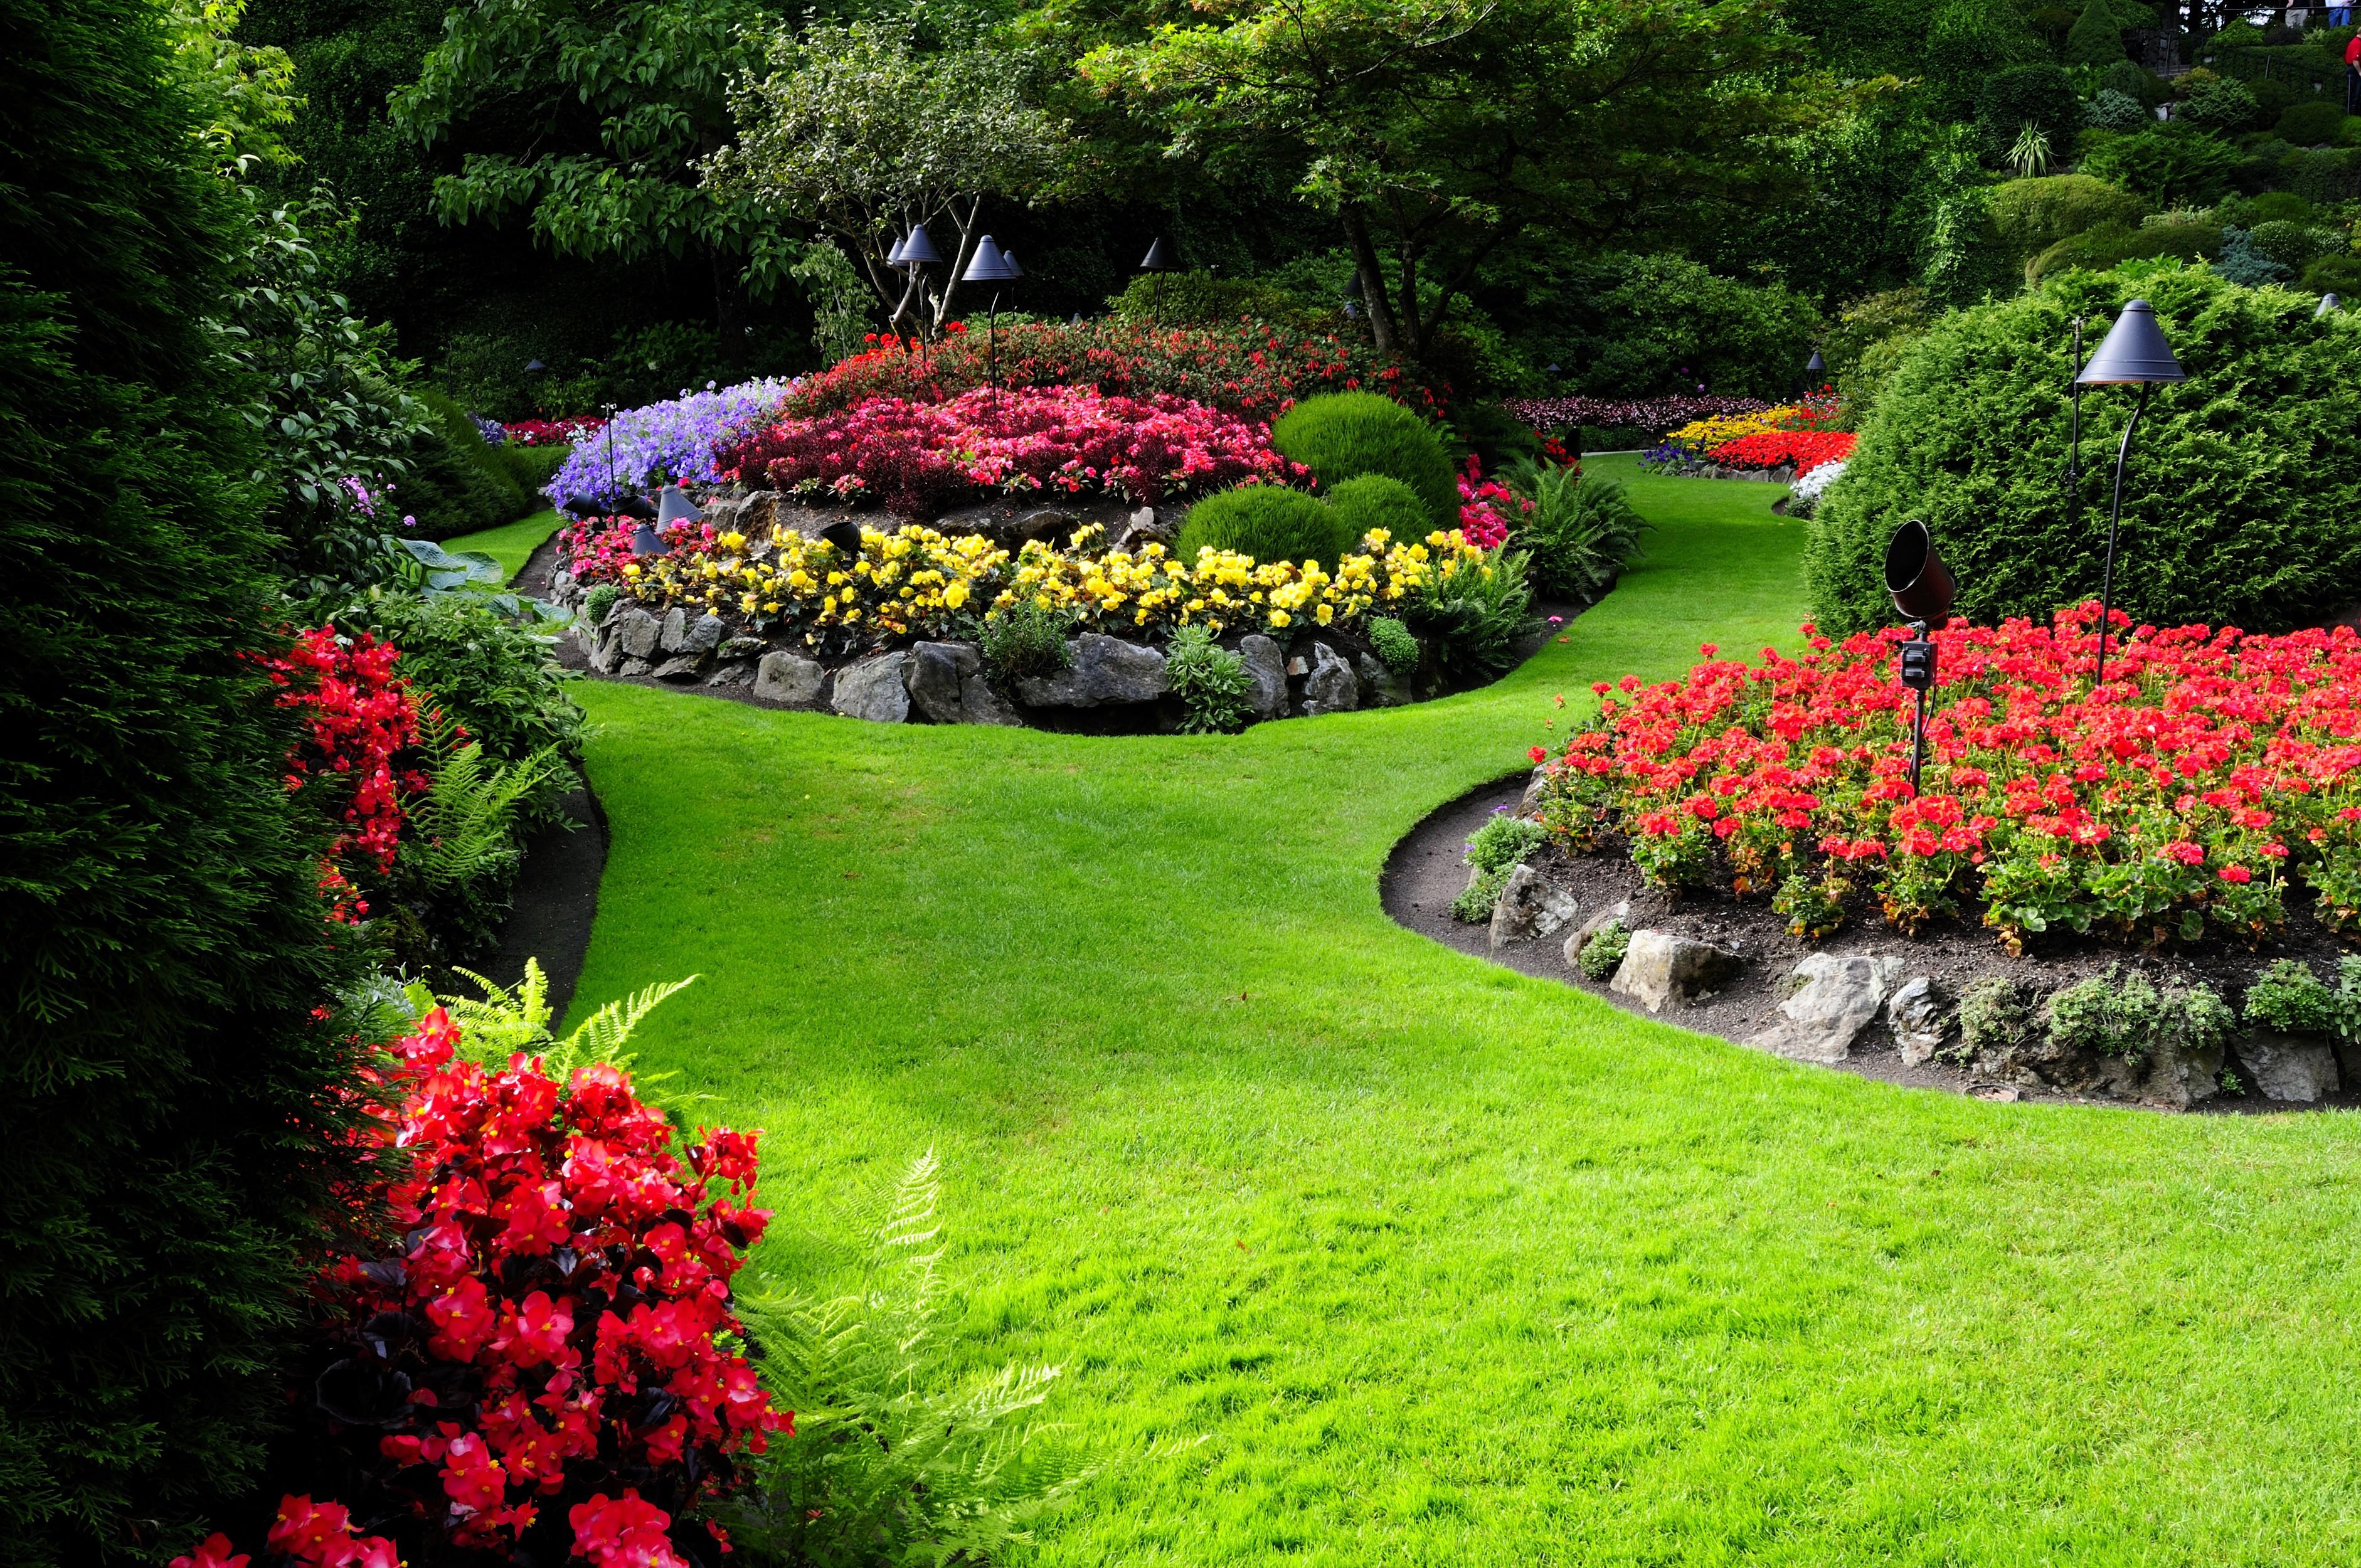 Fondos de pantalla paisaje flores naturaleza patio - Fotografias de jardines ...